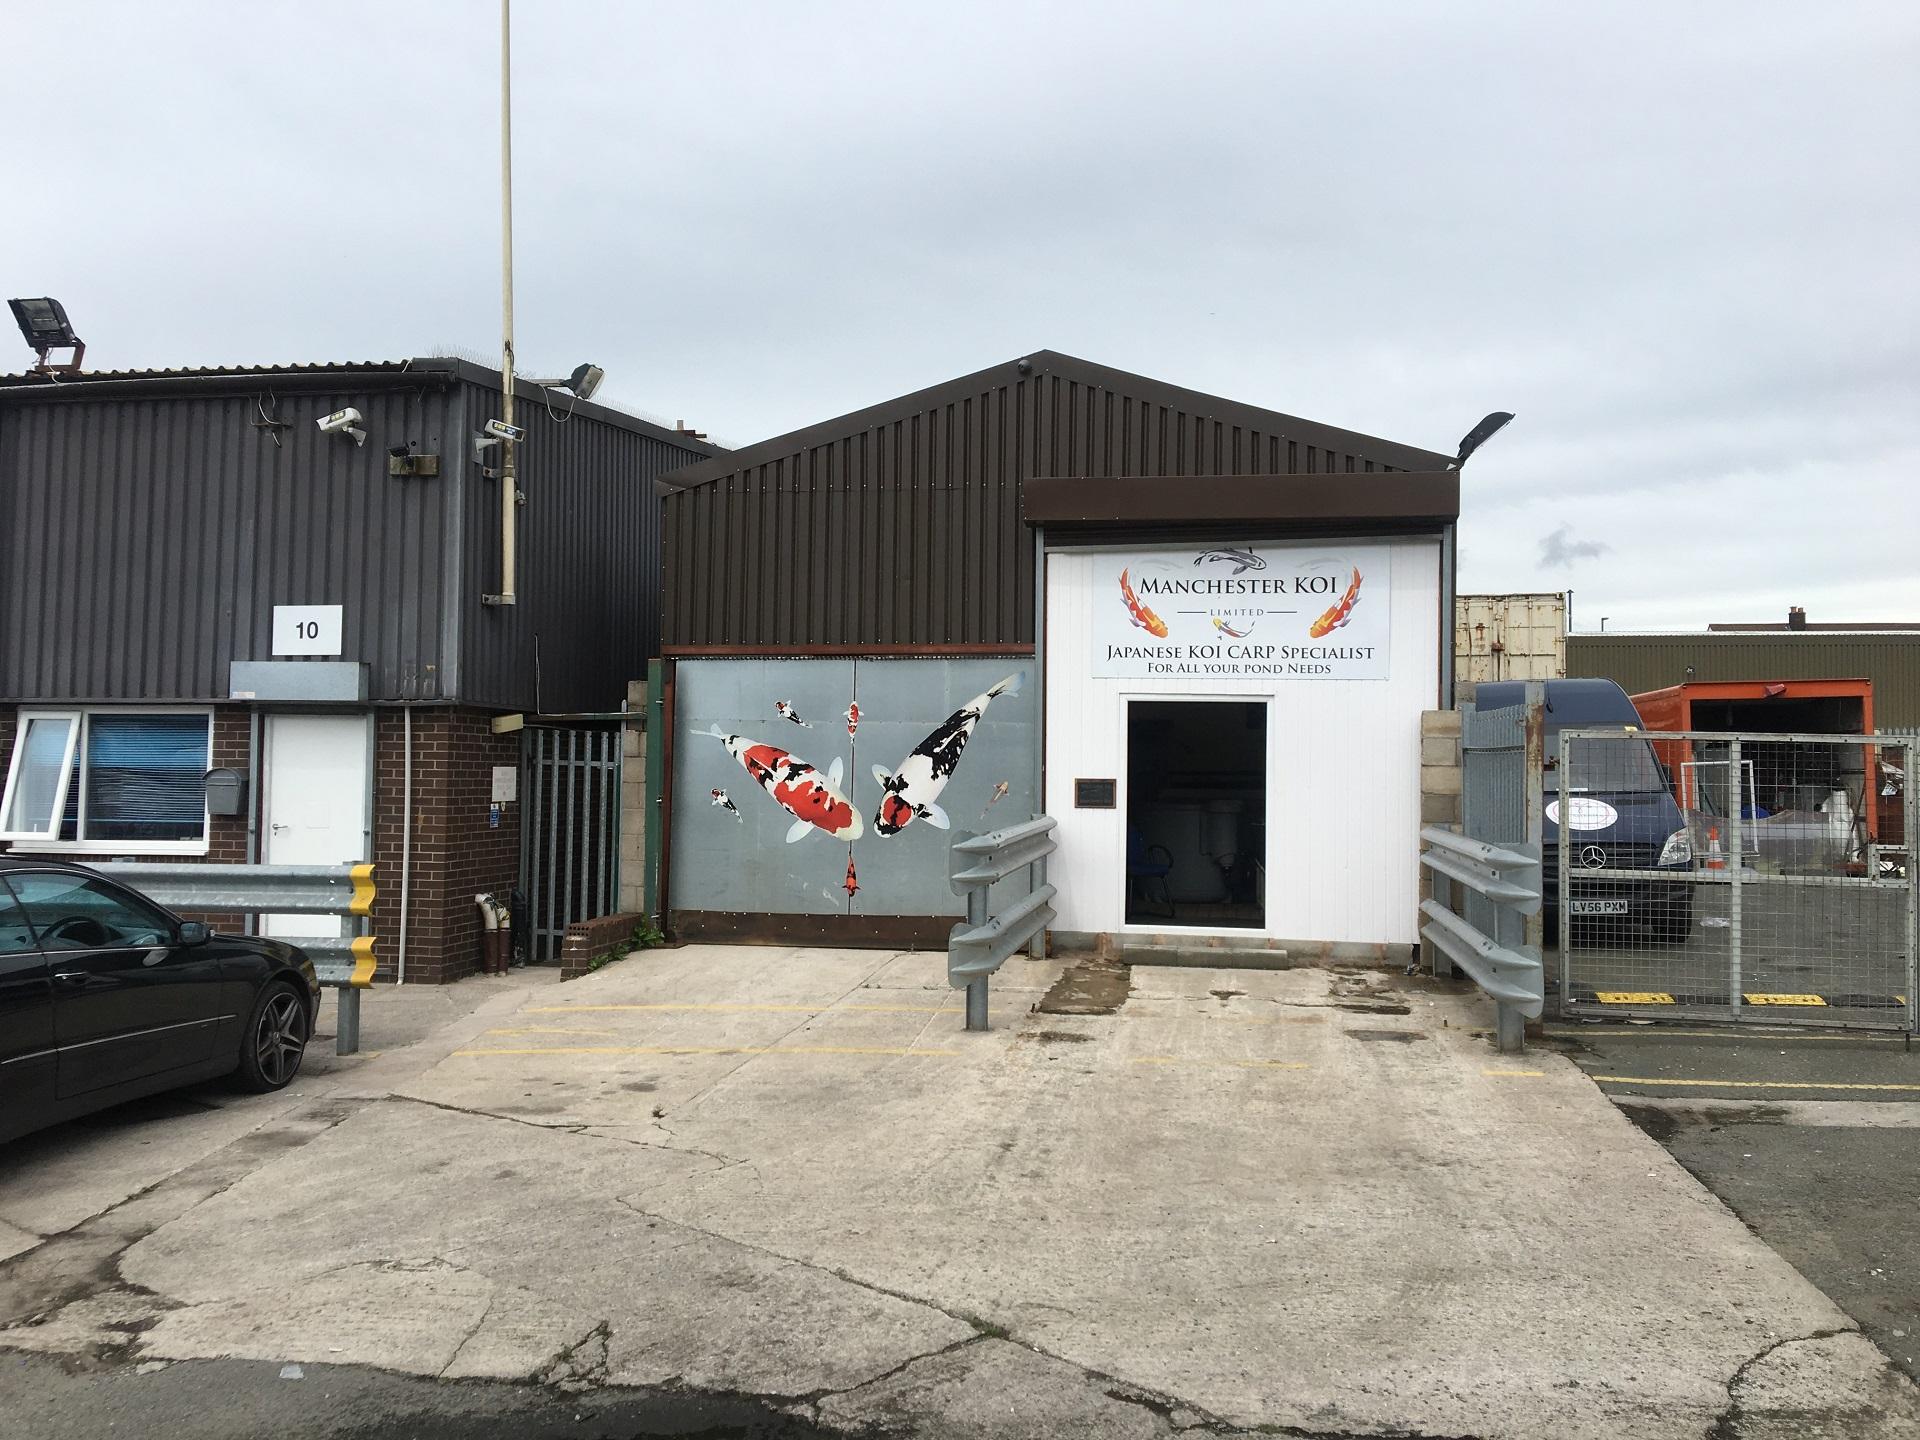 10a MISSOURI AVENUE SALFORD INDUSTRIAL UNIT WITH KOI CARP BUSINESS